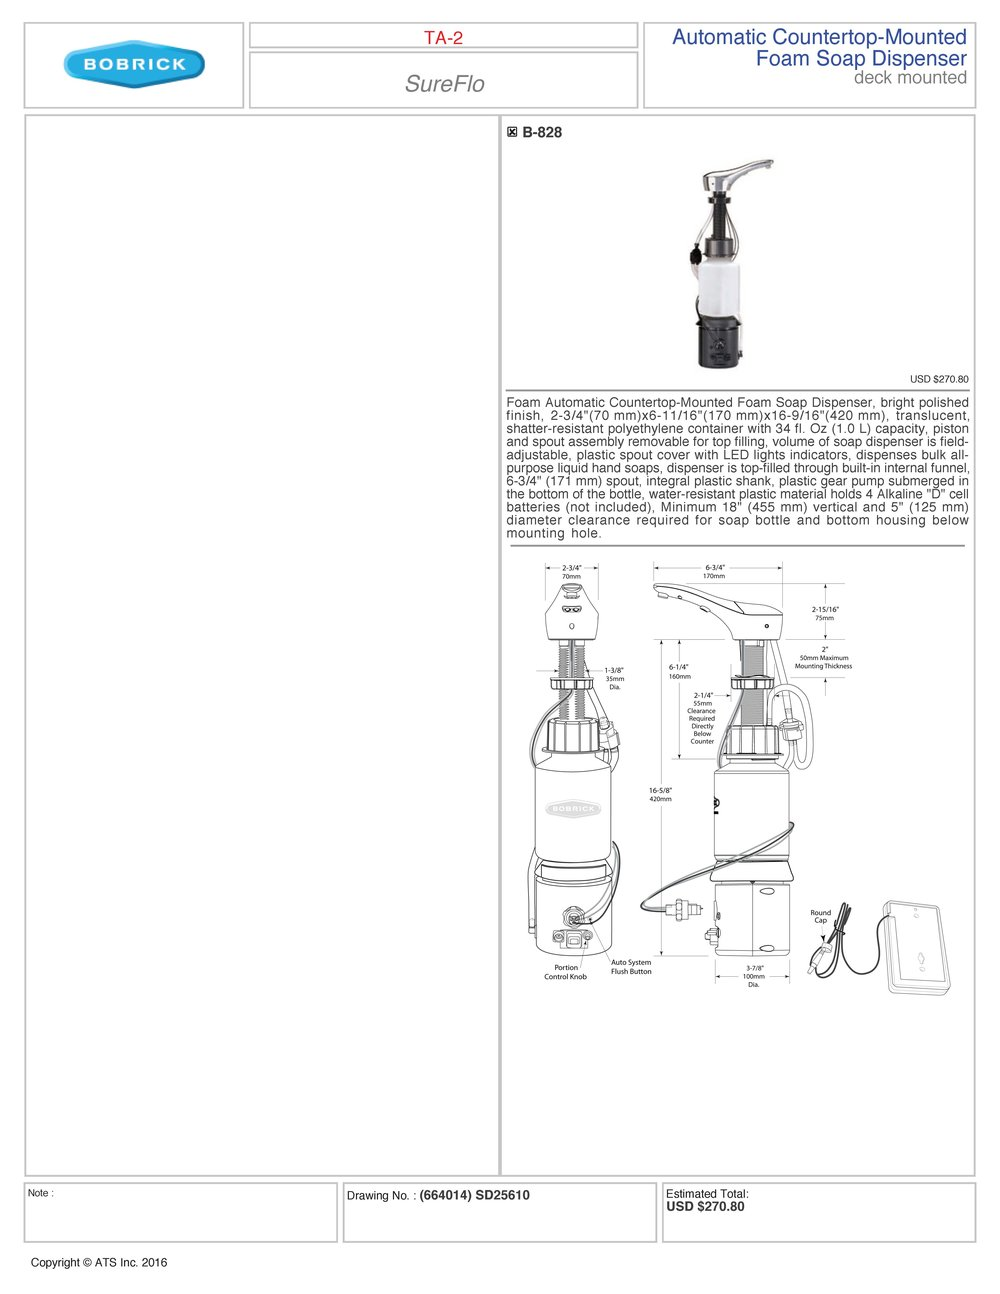 Pharmaceutical Building Cutsheets_Page_07.jpg